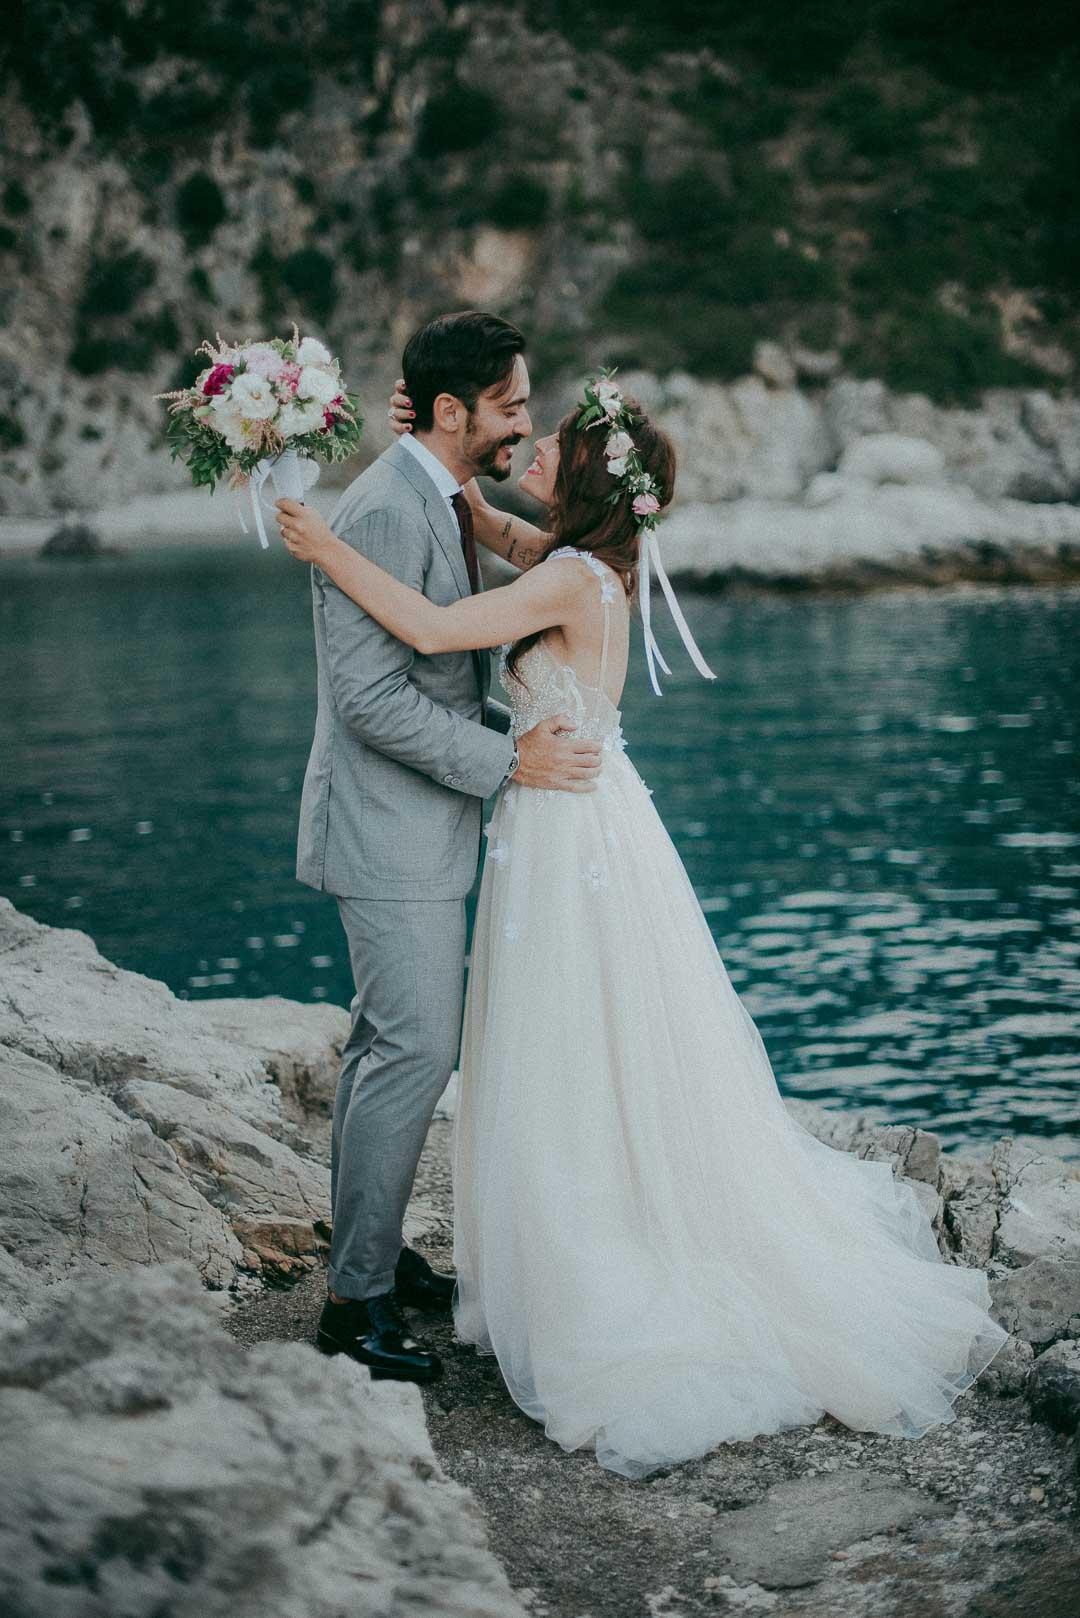 wedding-photographer-destination-fineart-bespoke-reportage-amalficoast-torrelacerniola-vivianeizzo-spazio46-78